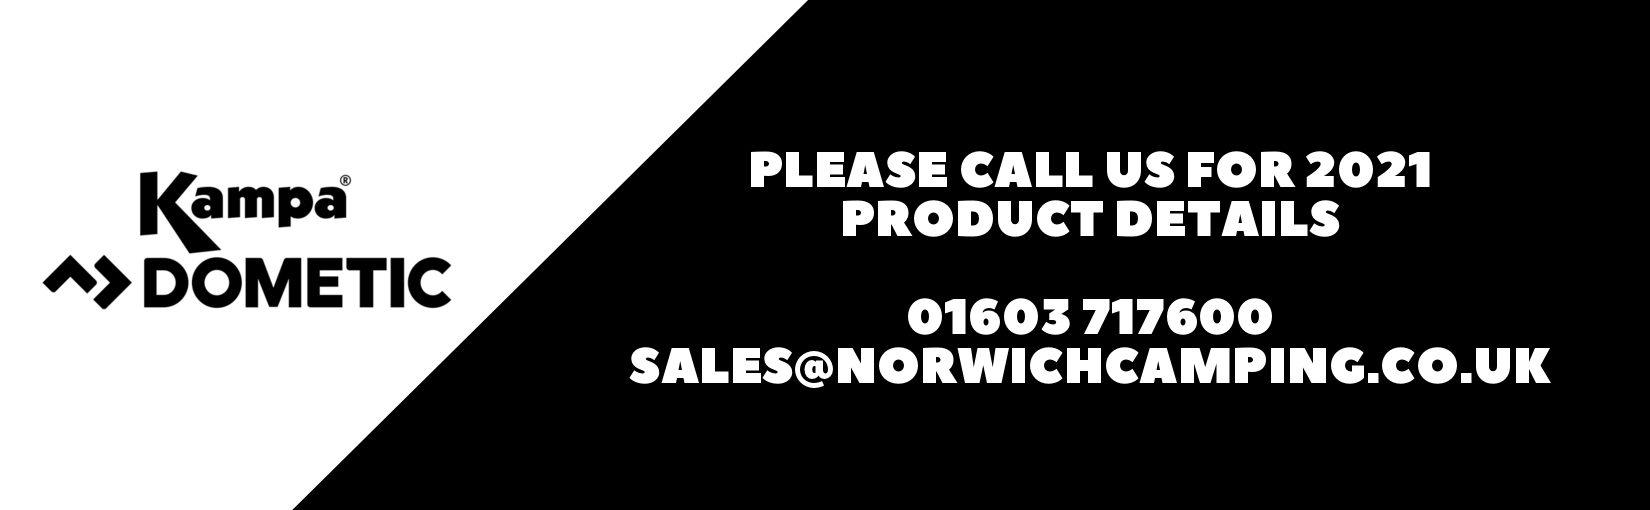 1650X510 Kampa Dometic 2021 Call Us